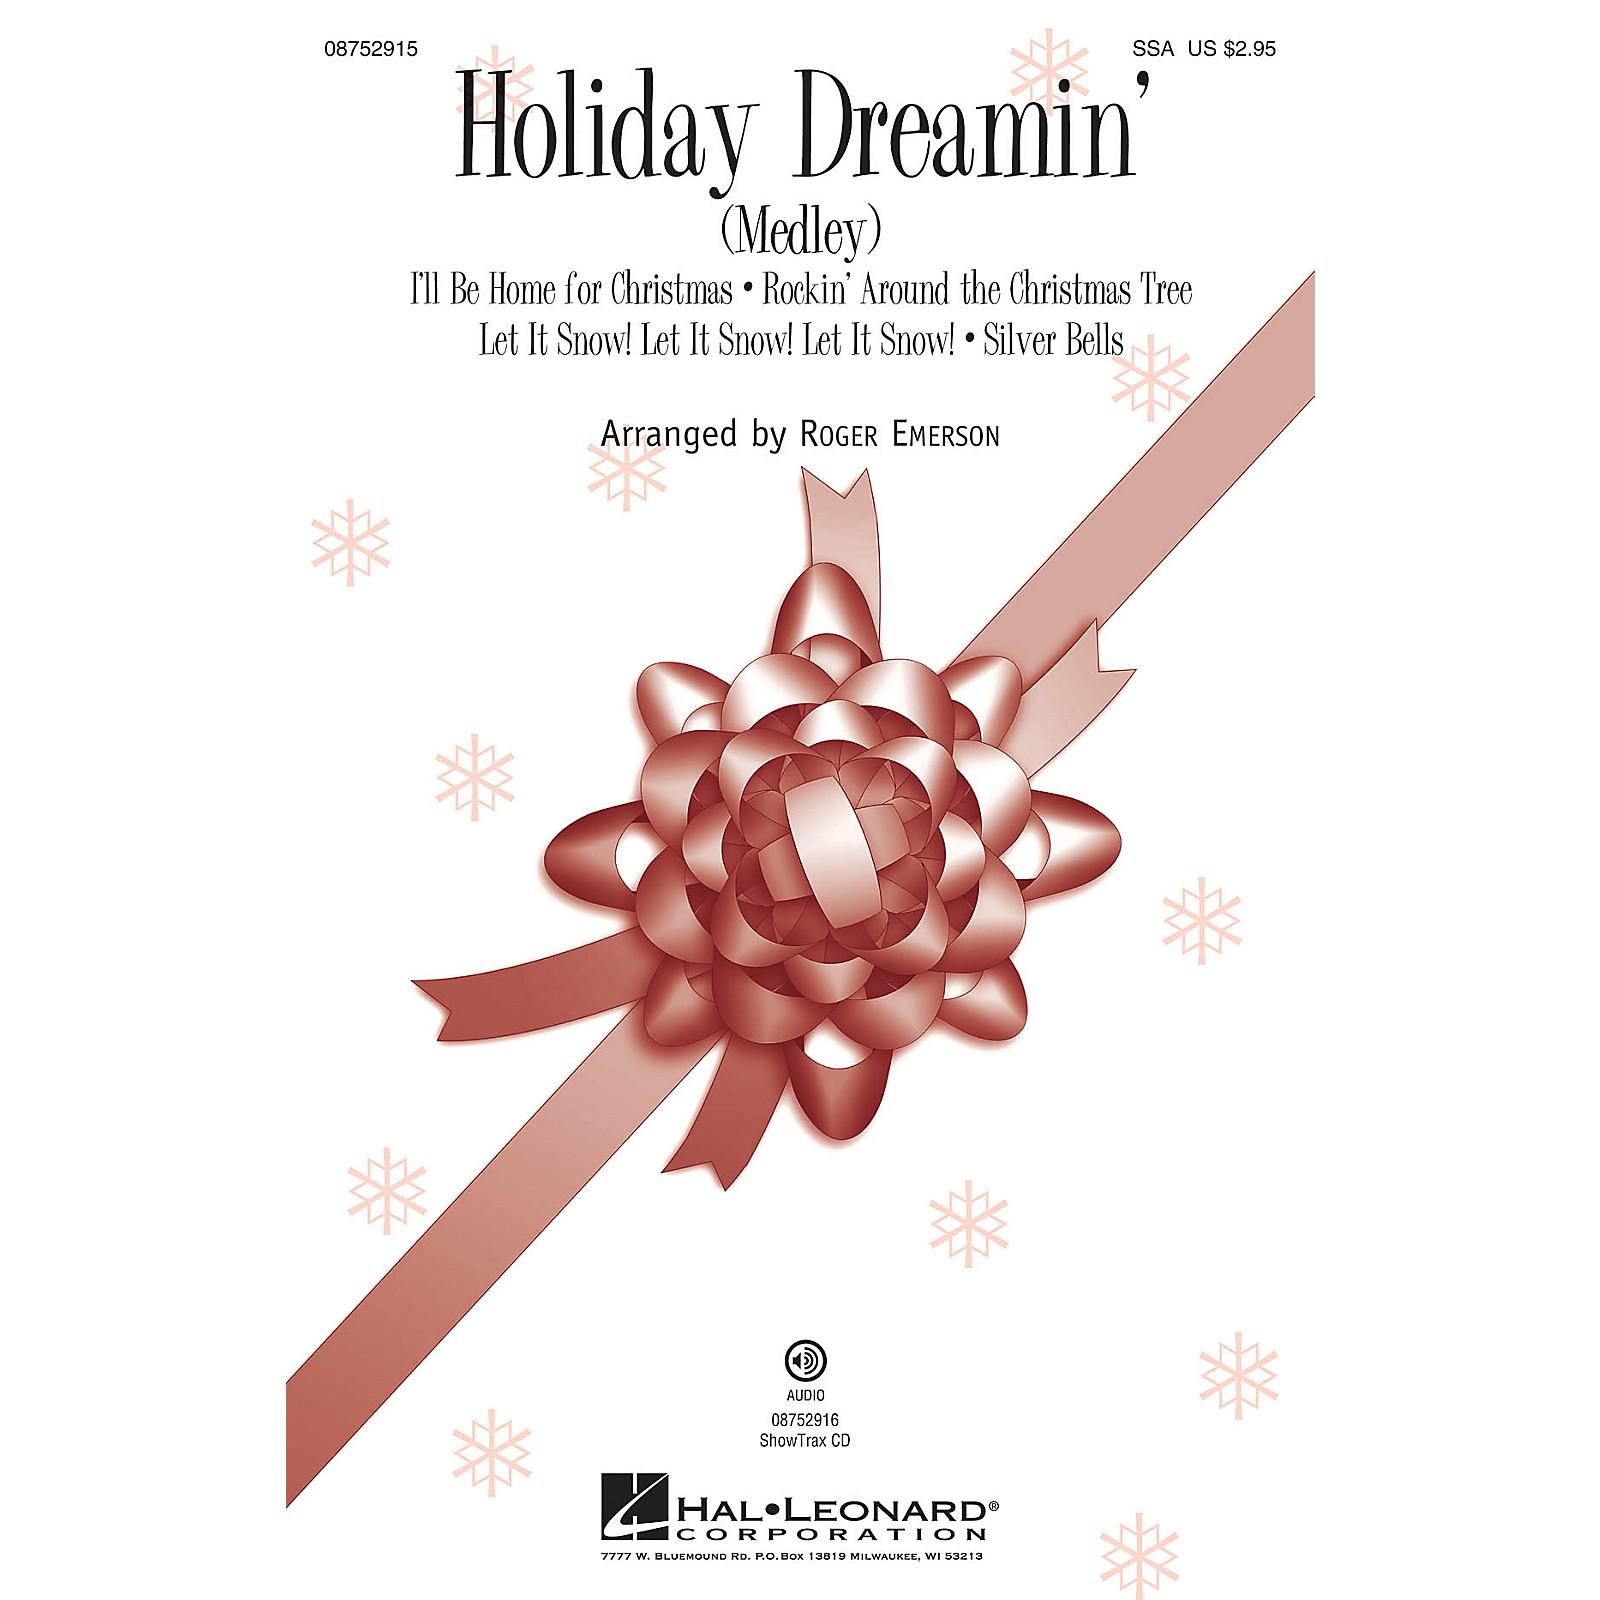 Hal Leonard Holiday Dreamin' (Medley) SSA arranged by Roger Emerson